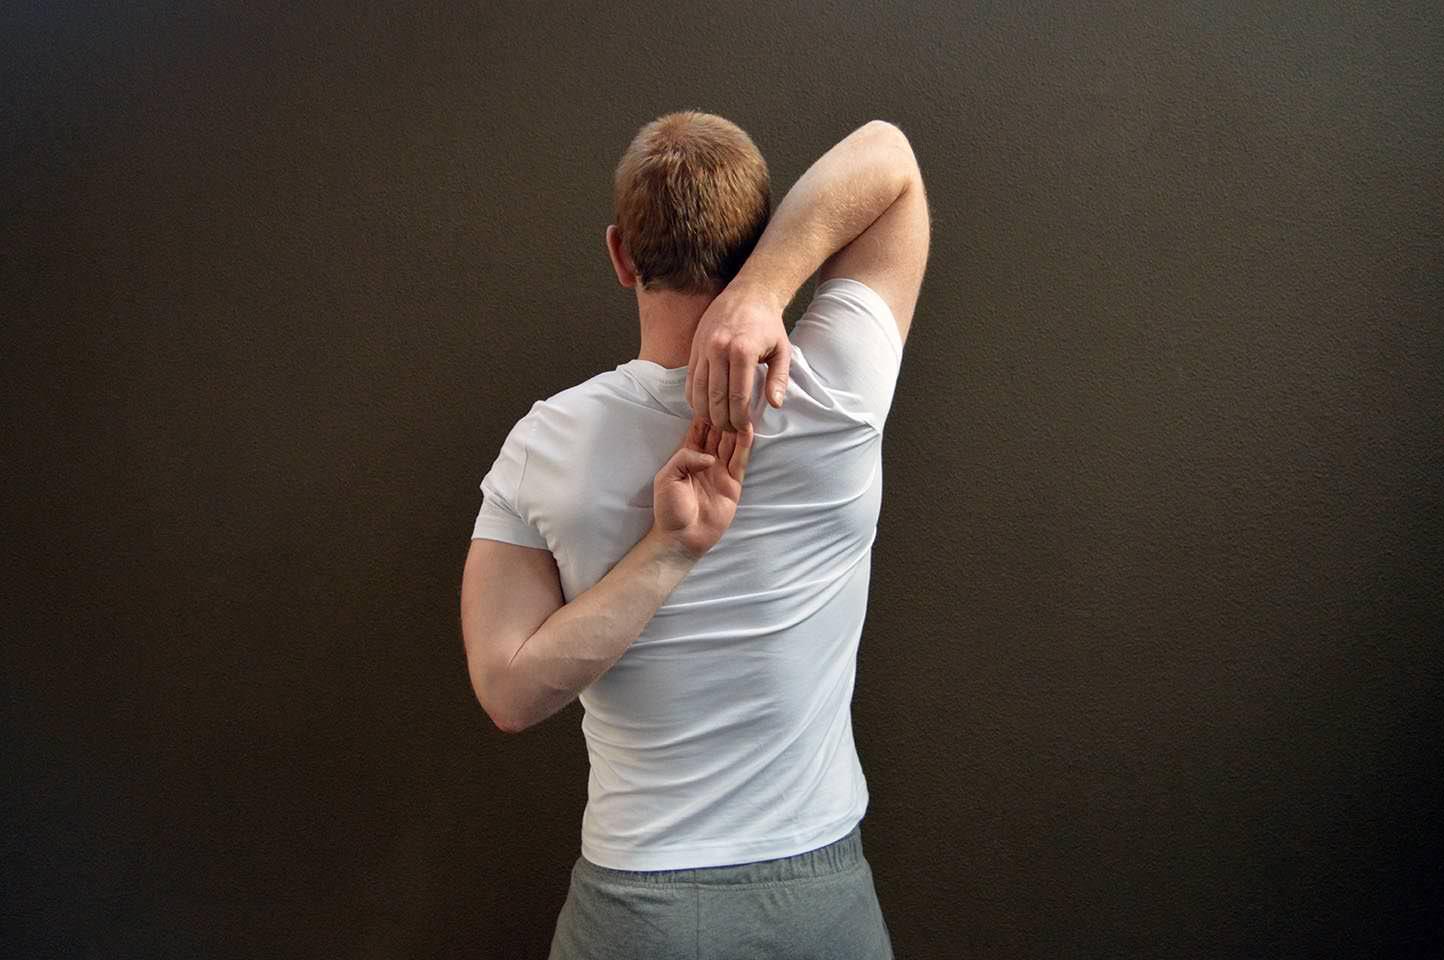 Étirement triceps - Position 3